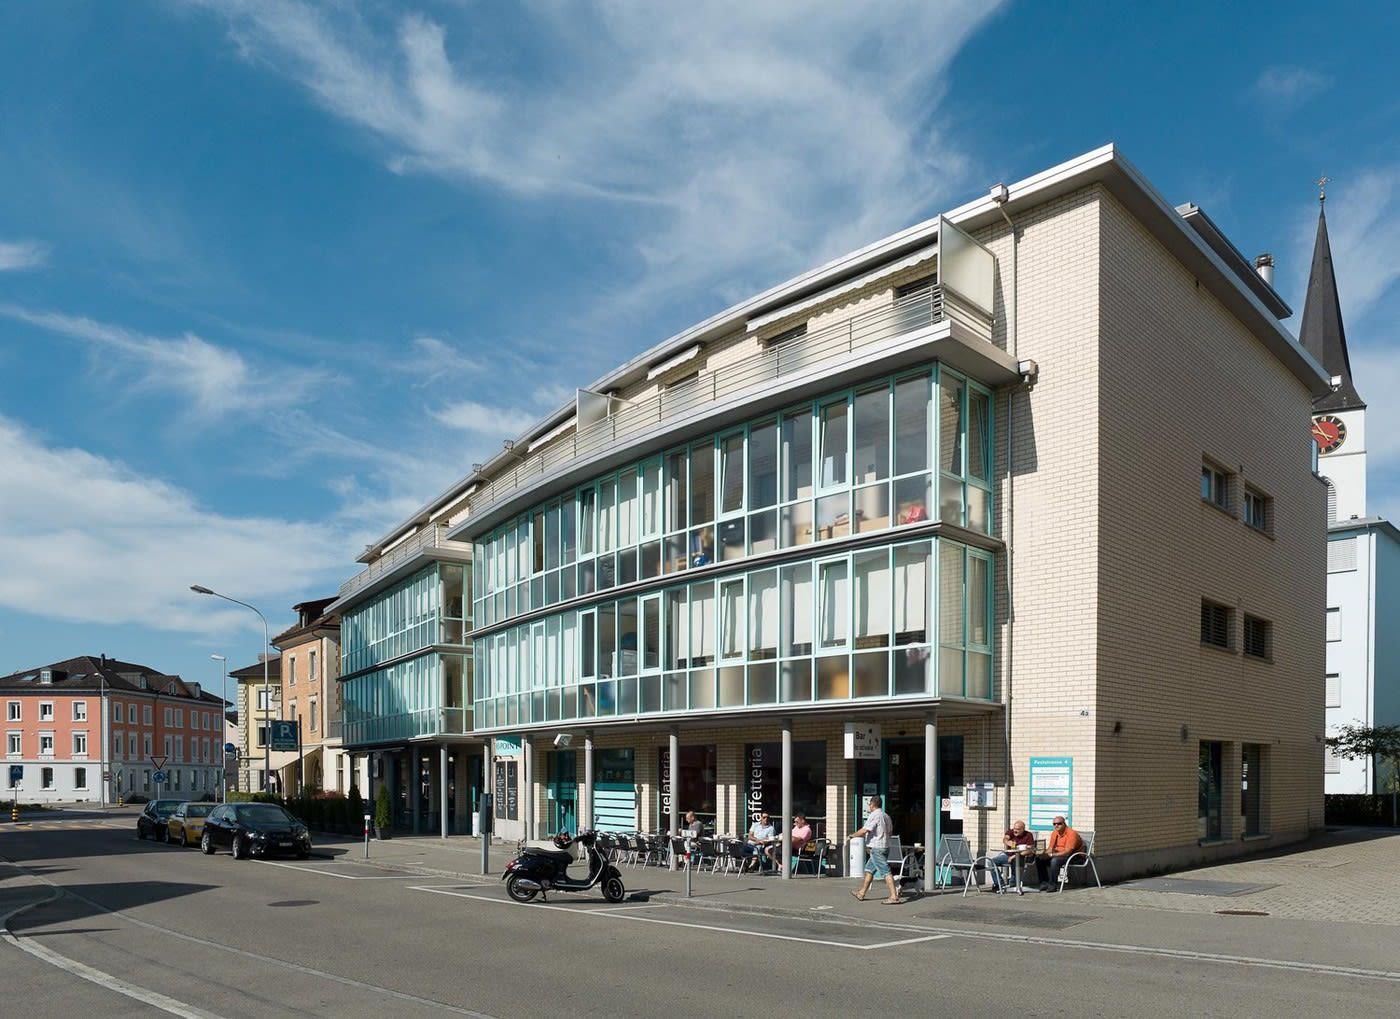 Poststrasse 4a